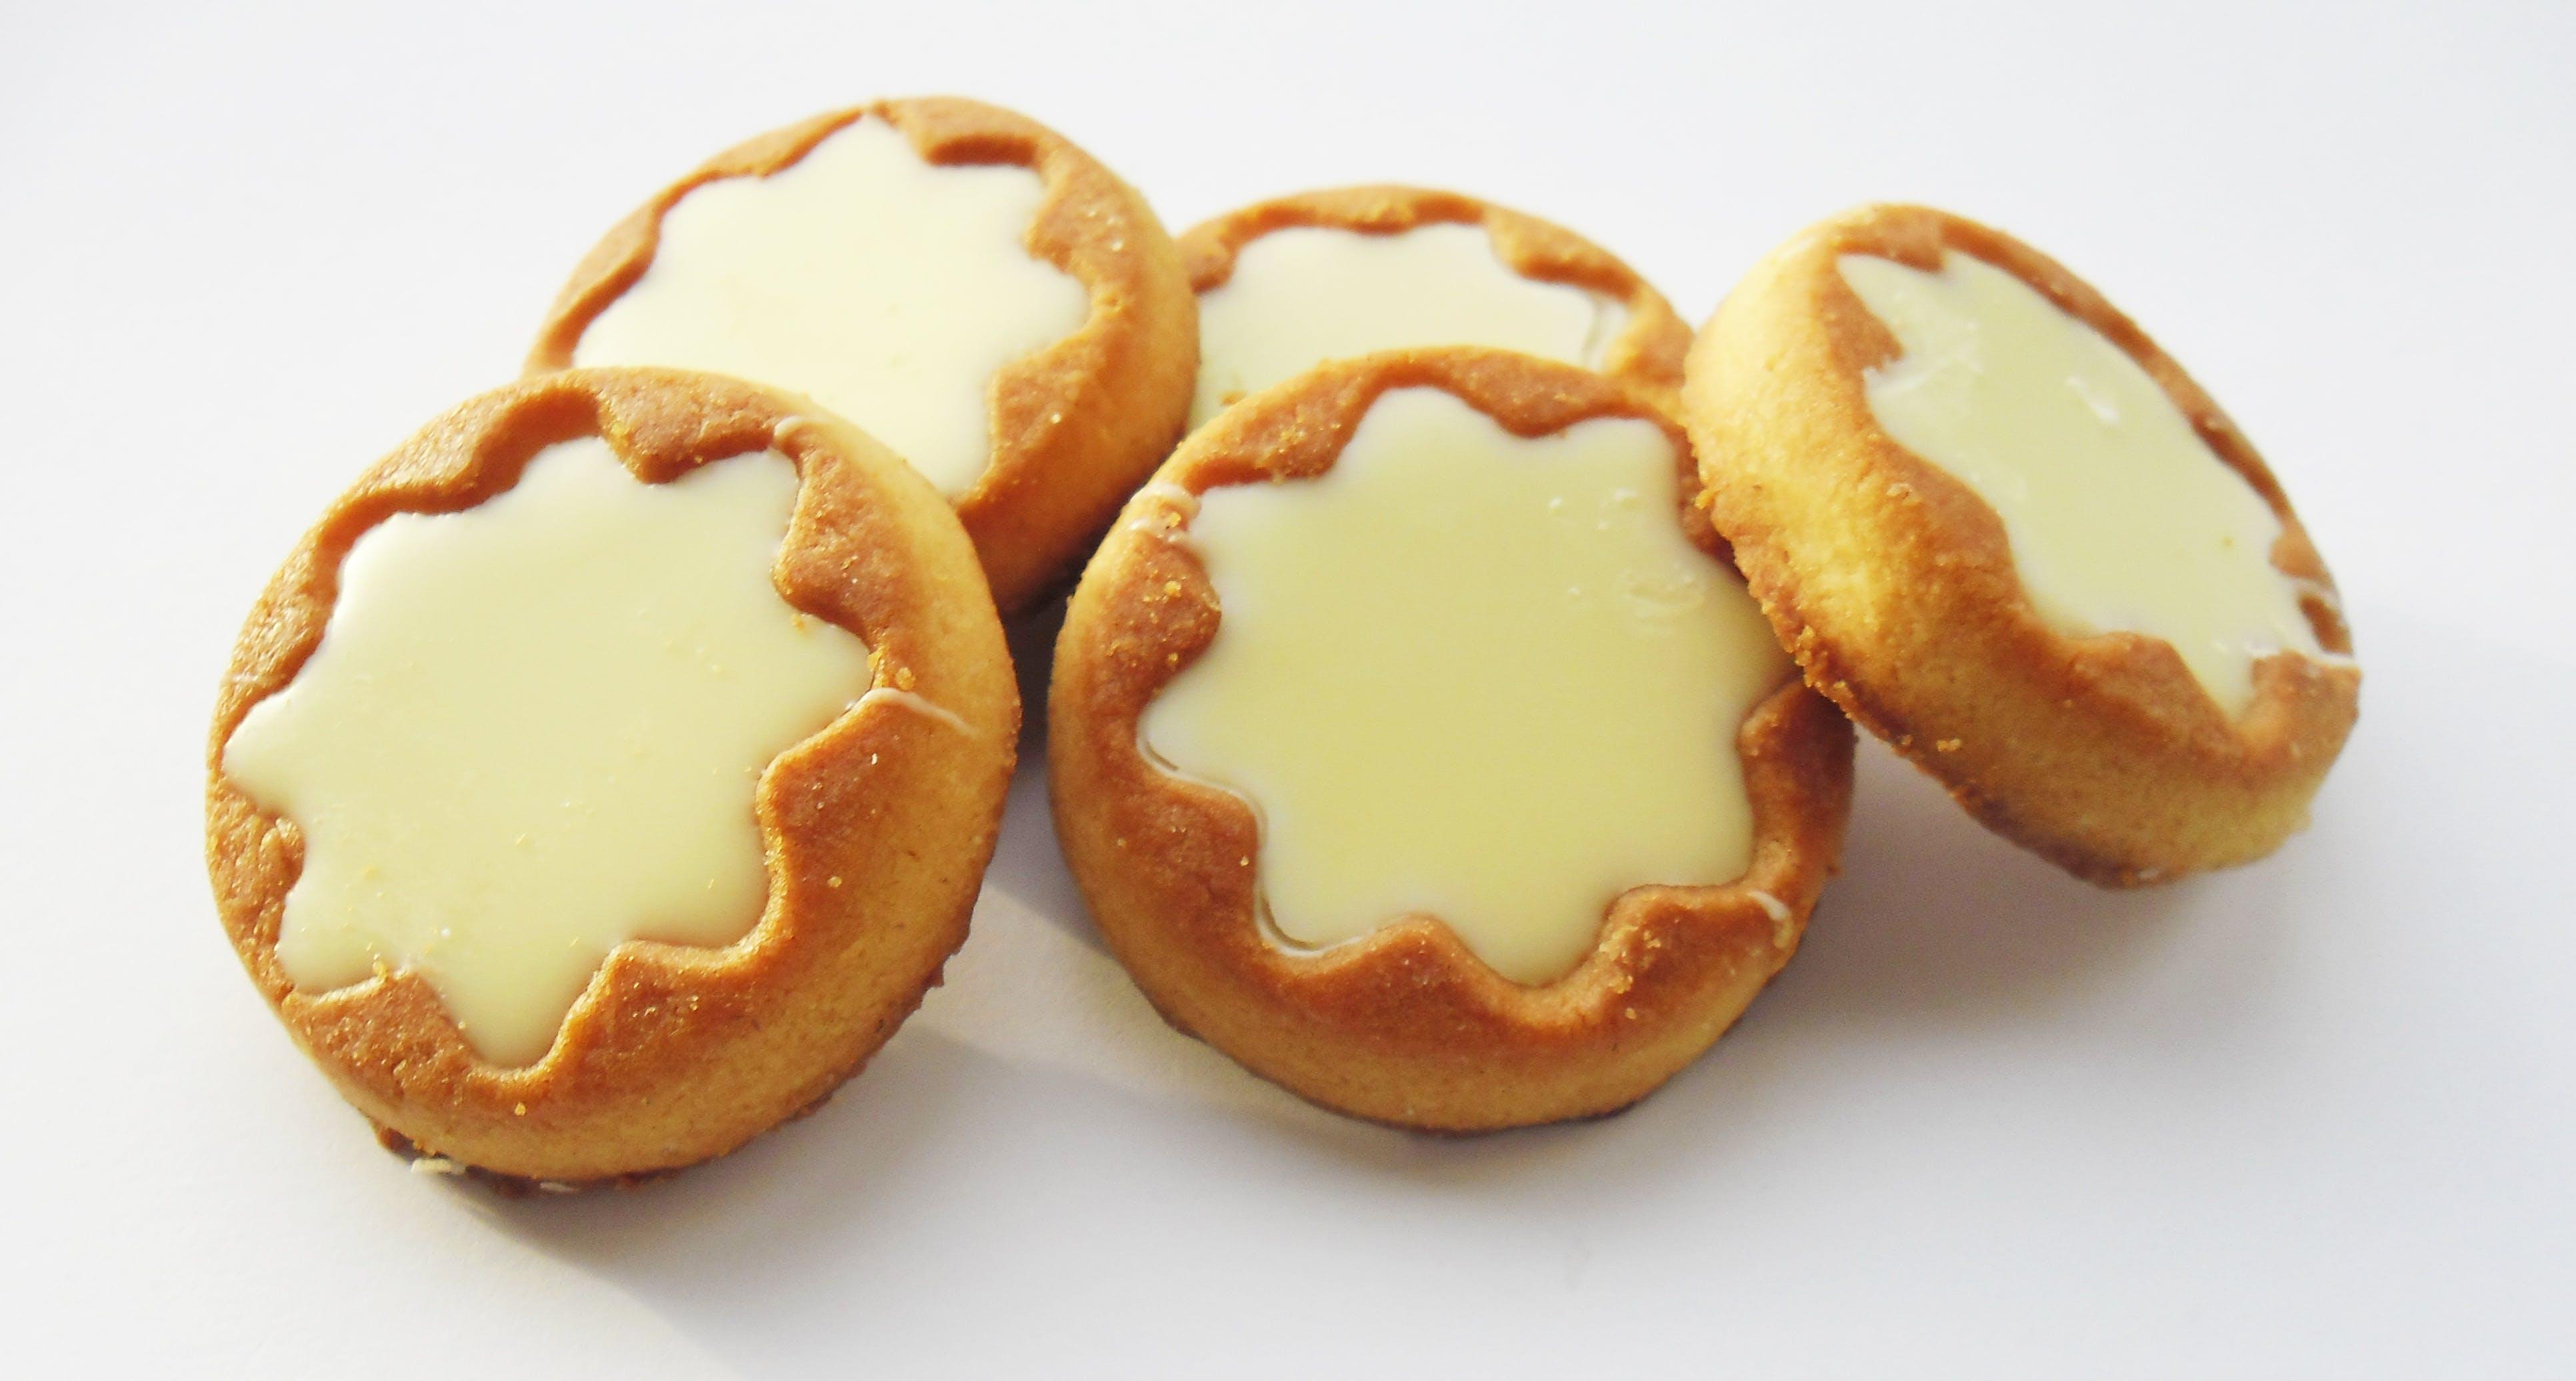 Free stock photo of cookies, cookie, advertisement, computer code